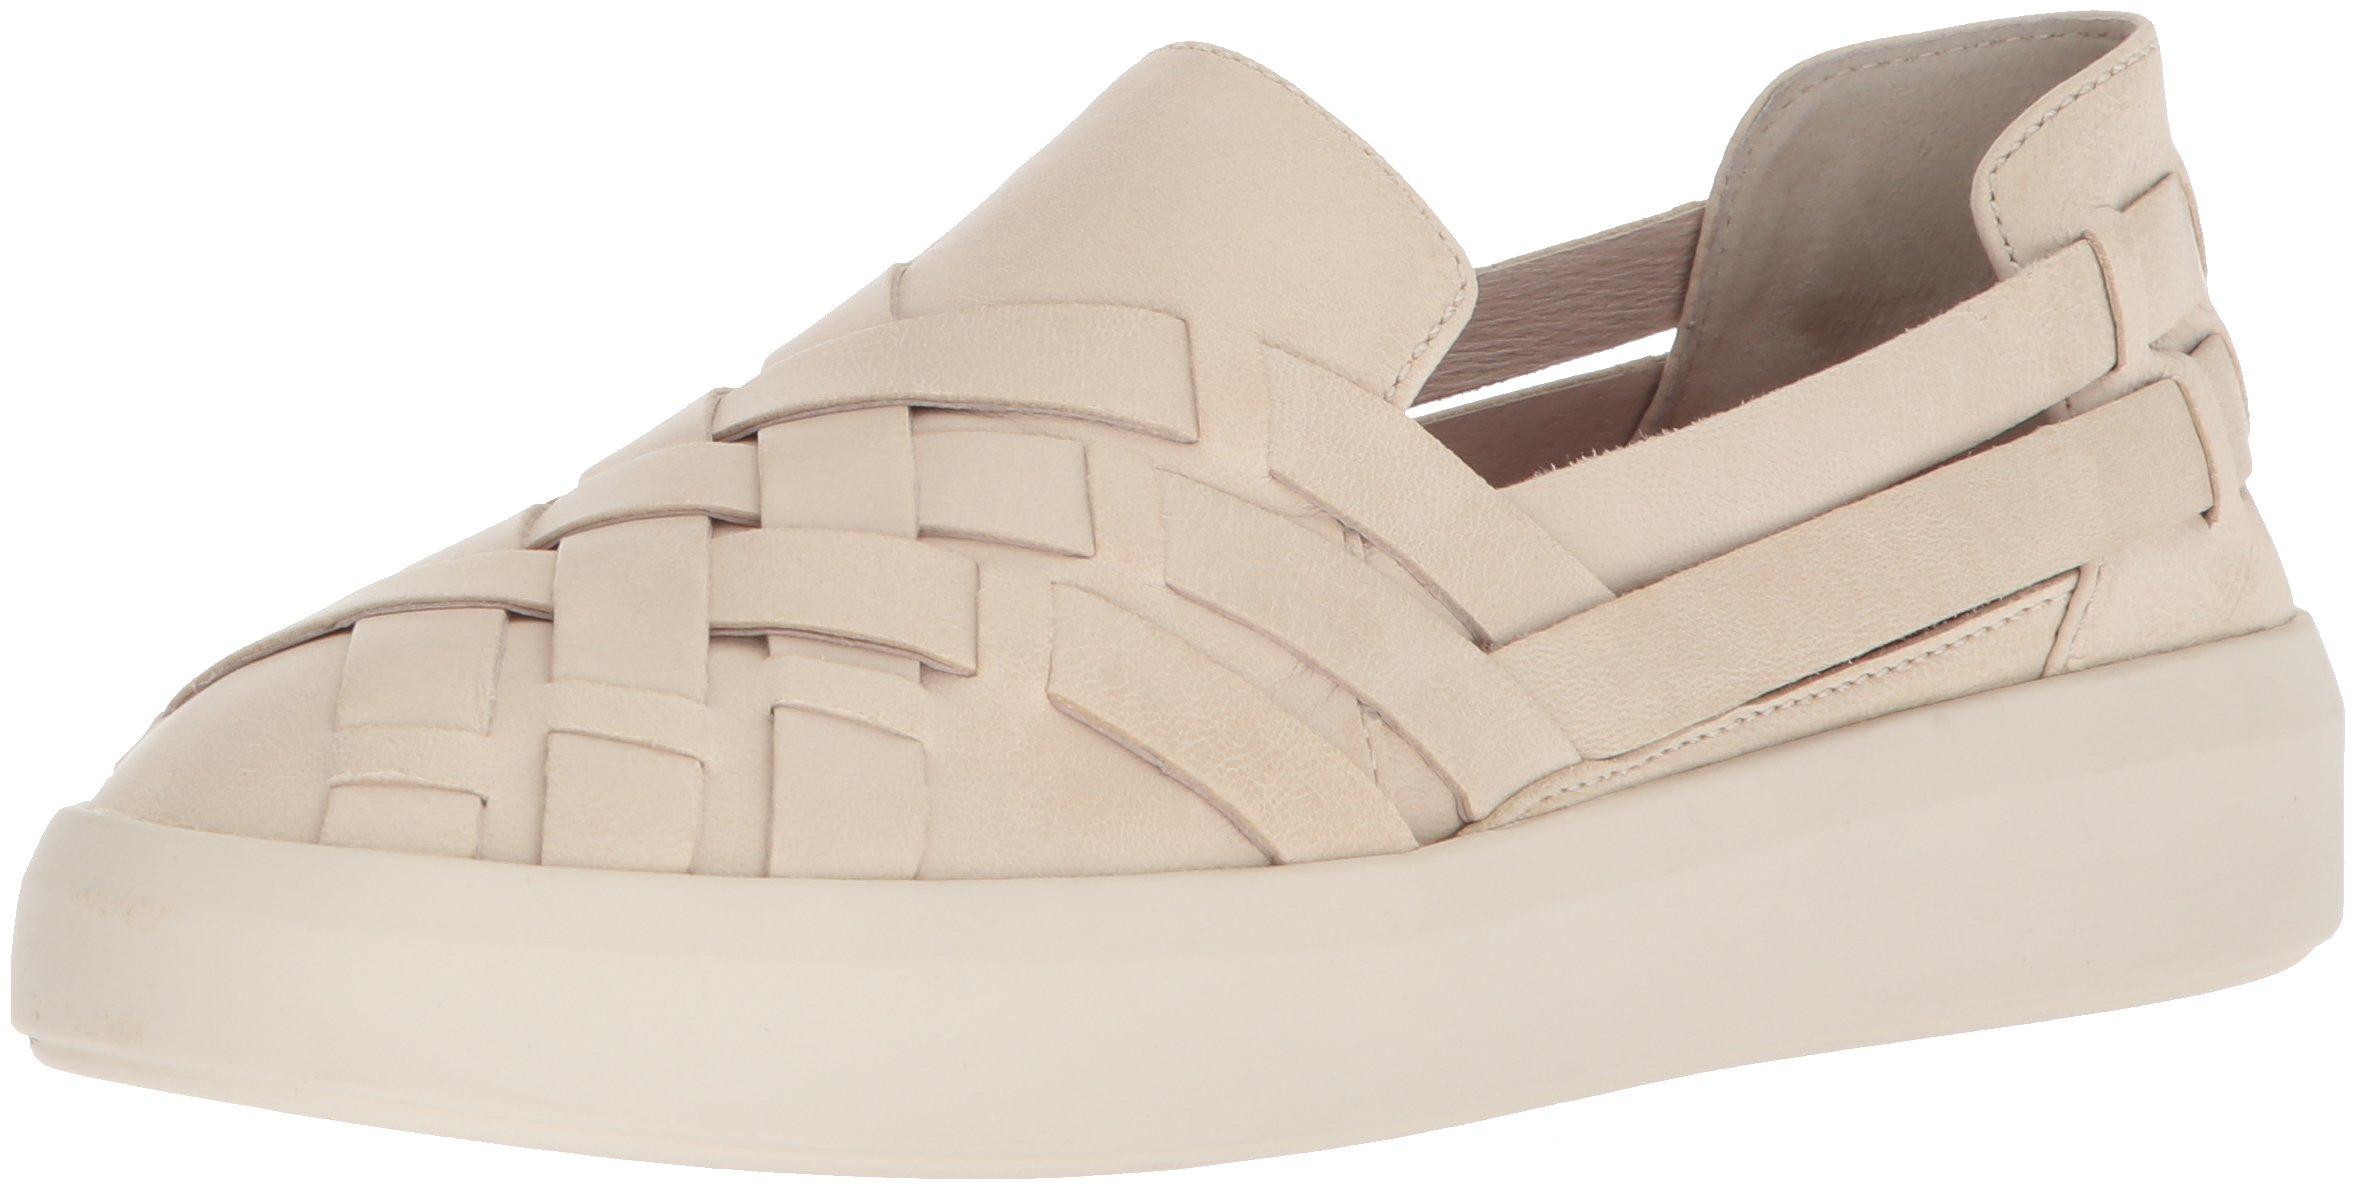 FRYE Women's Brea Hurache Slip On Sneaker, White, 9.5 M US